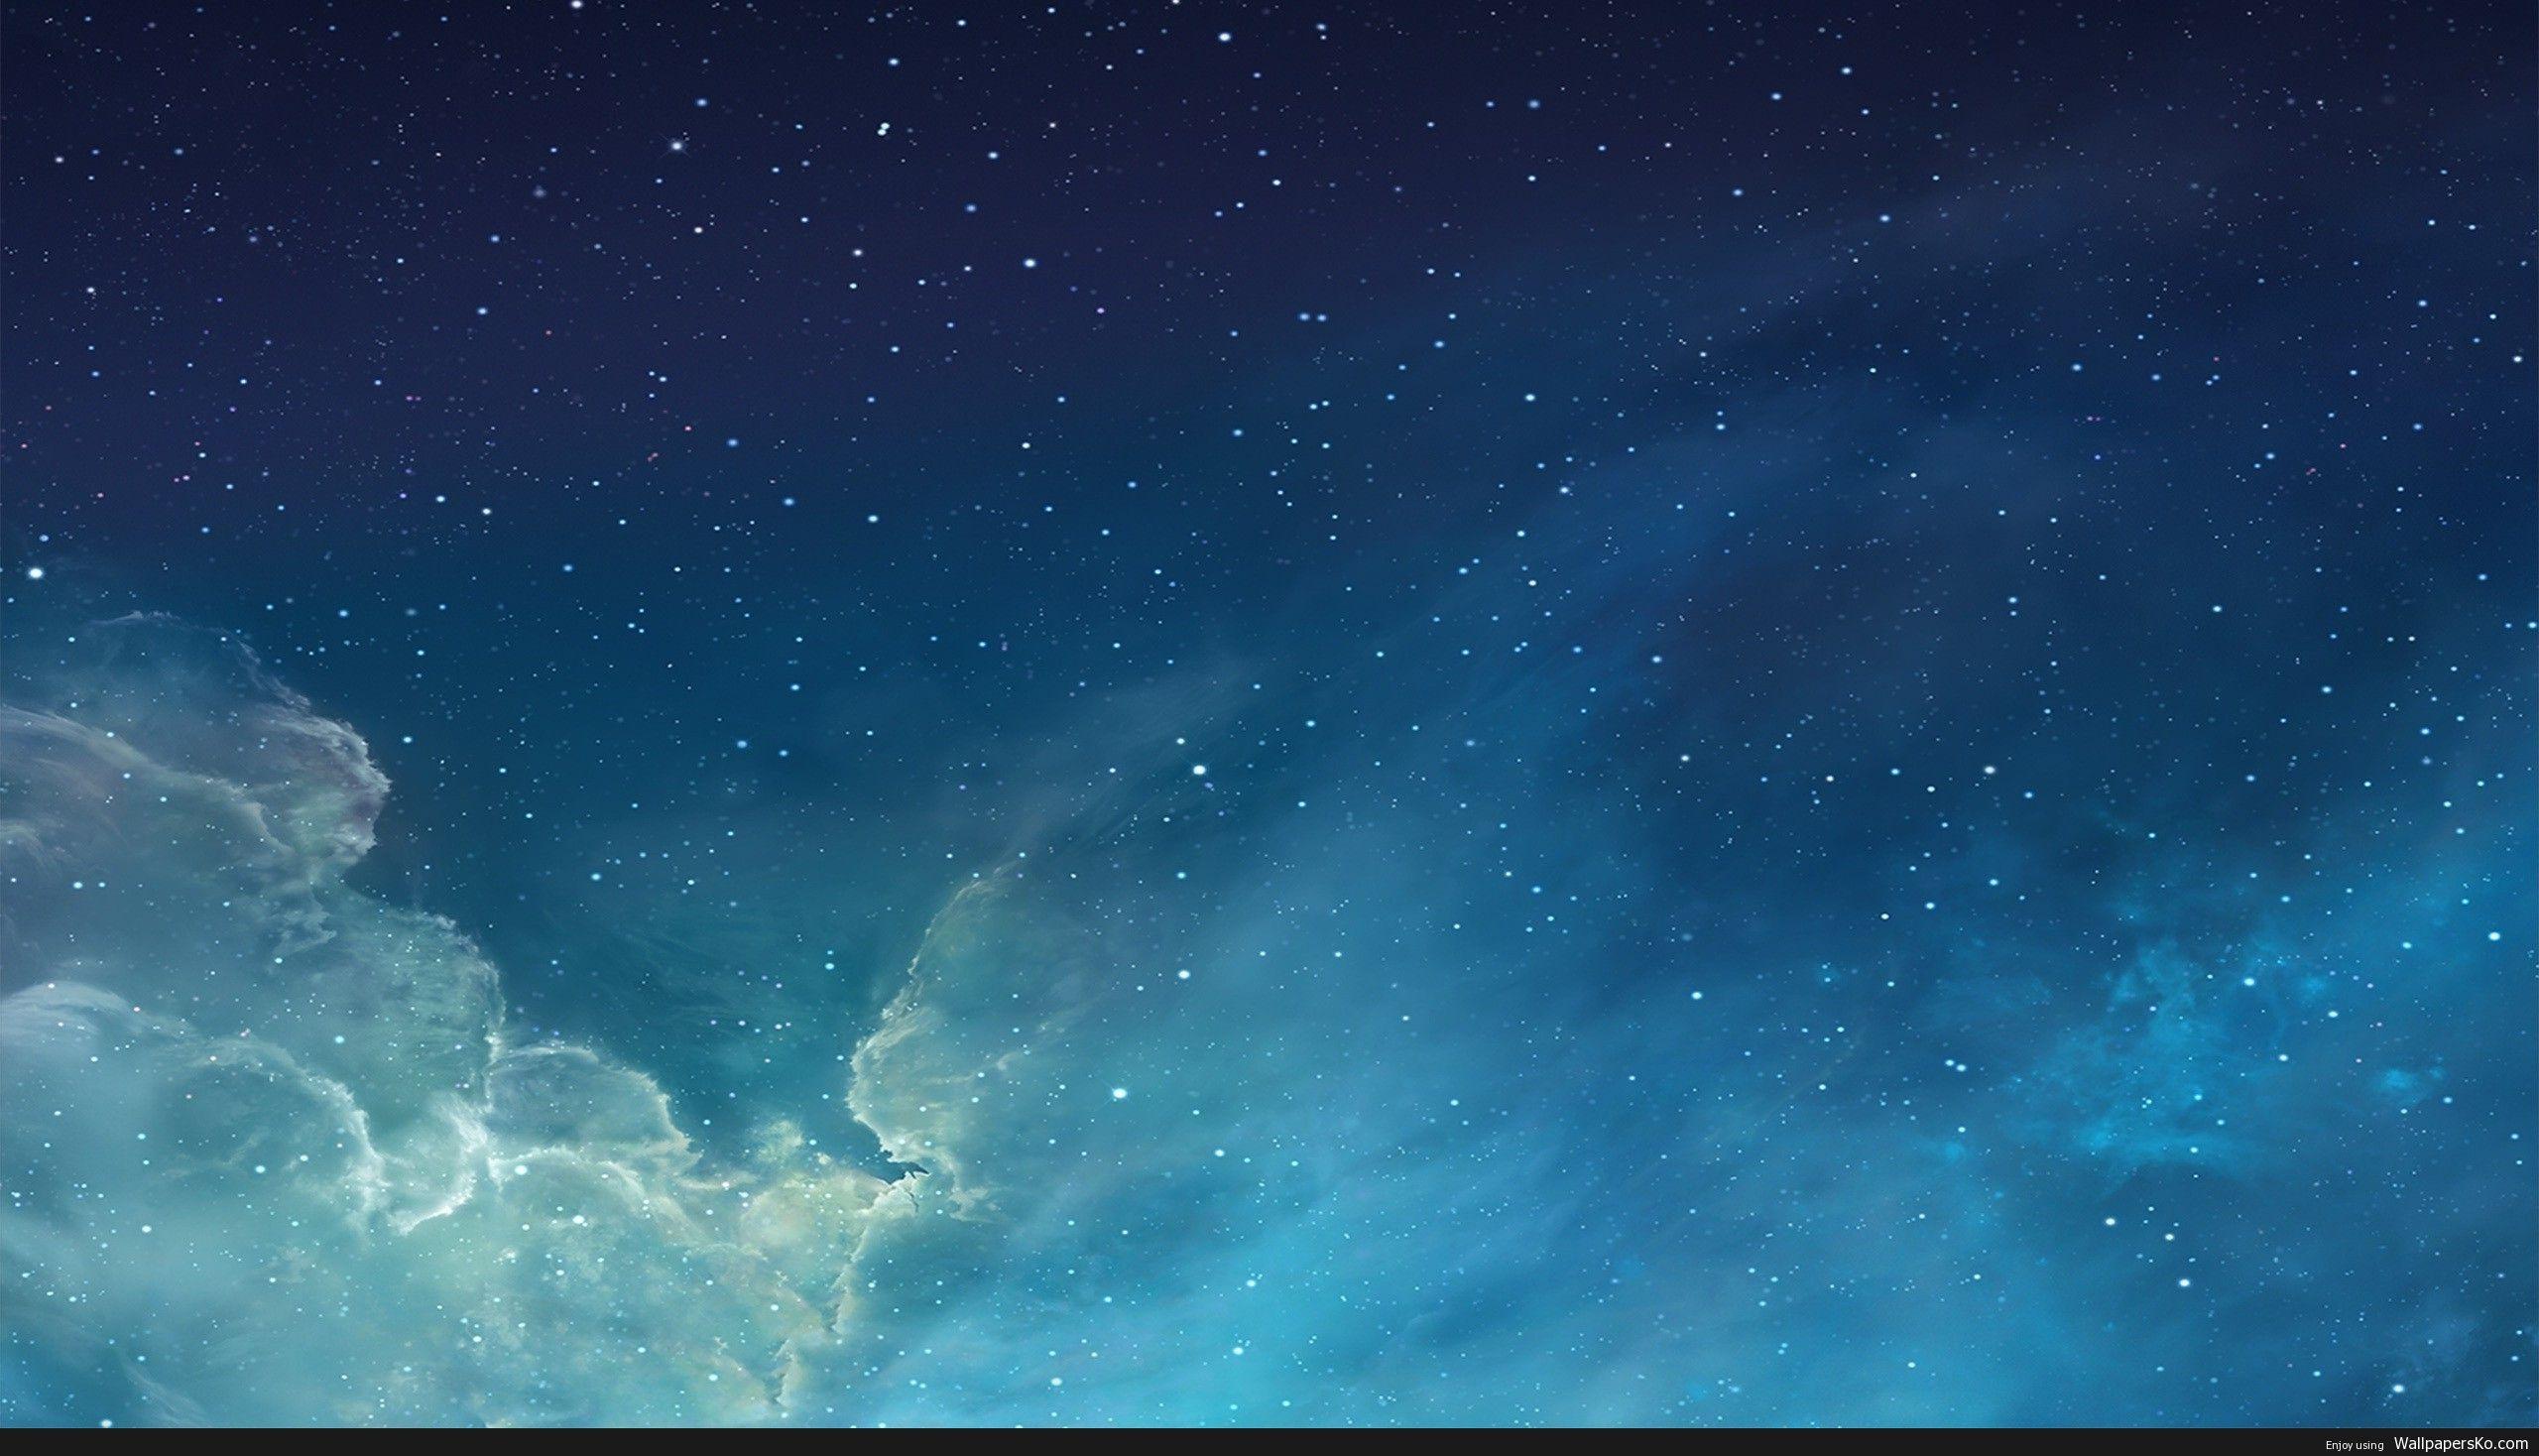 Stars Sky Wallpaper Http Wallpapersko Com Stars Sky Wallpaper Html Hd Wallpapers Download Night Sky Wallpaper Night Sky Hd Star Sky